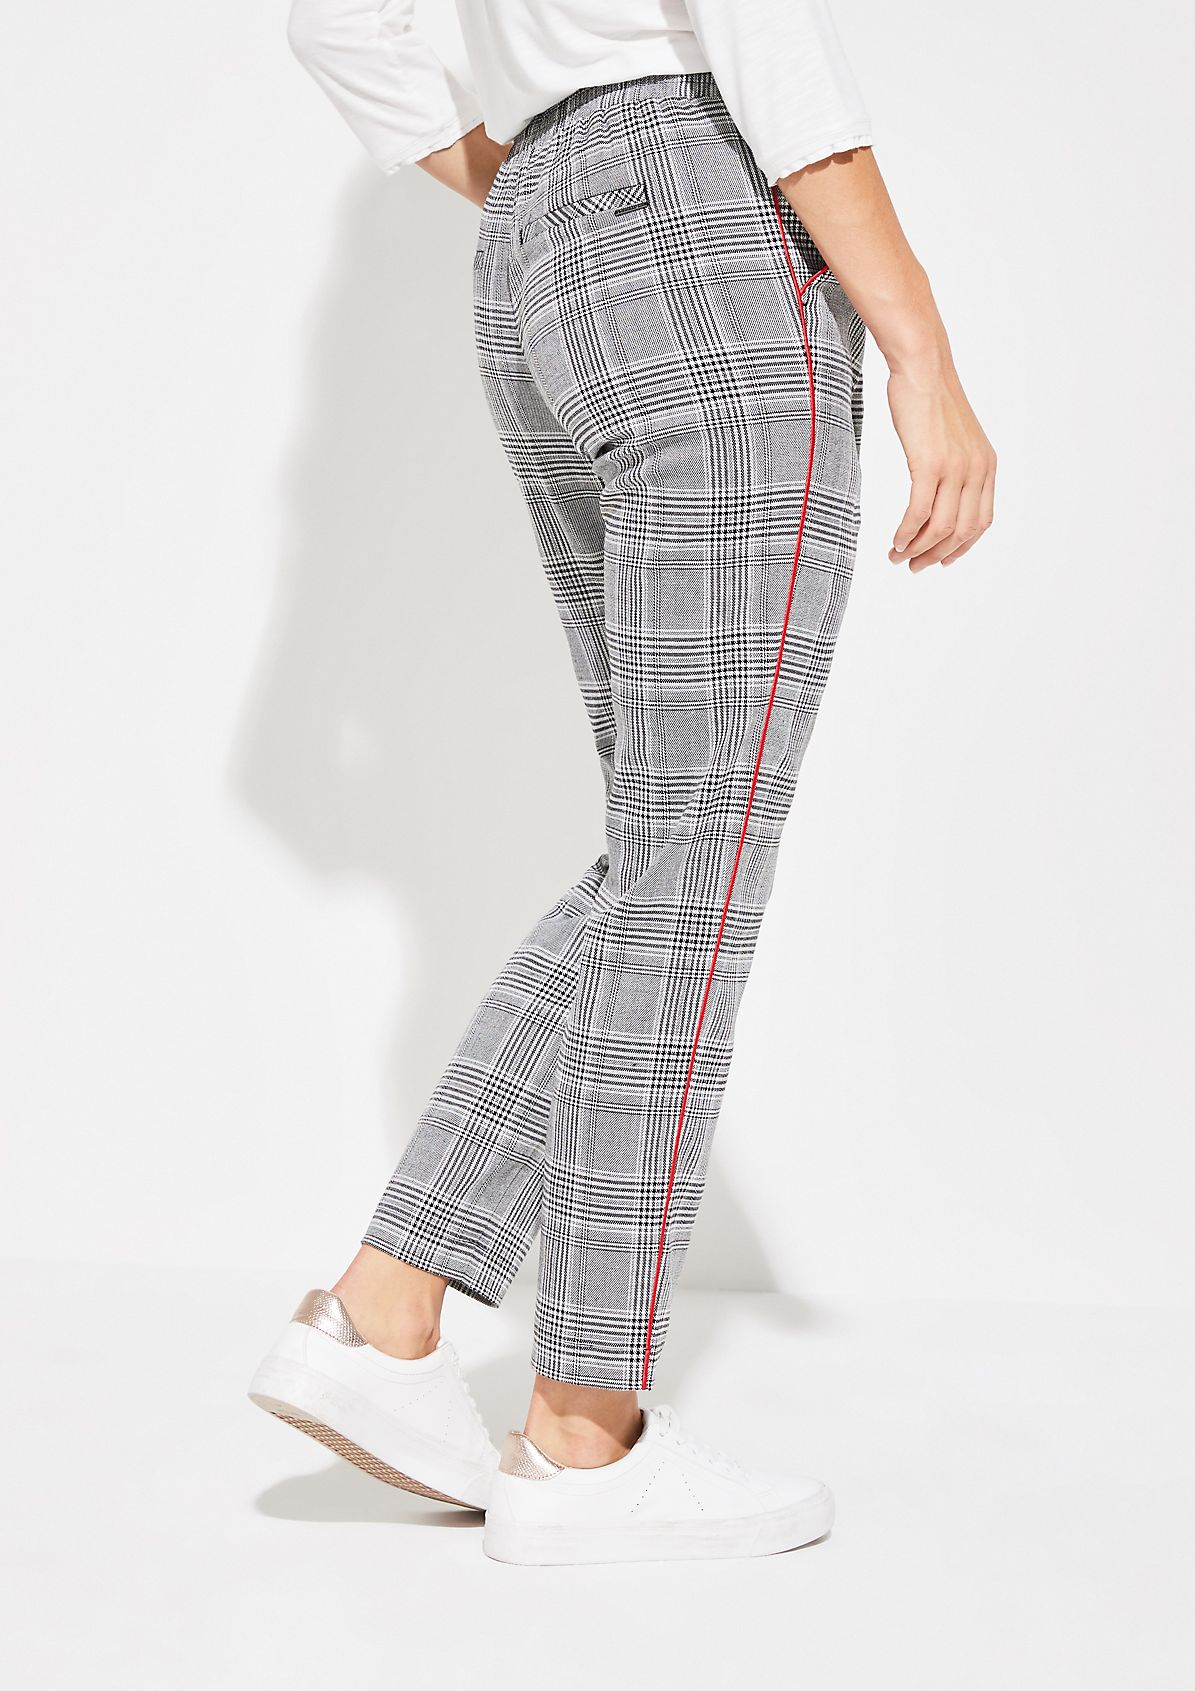 Loungepants mit Glencheckmuster